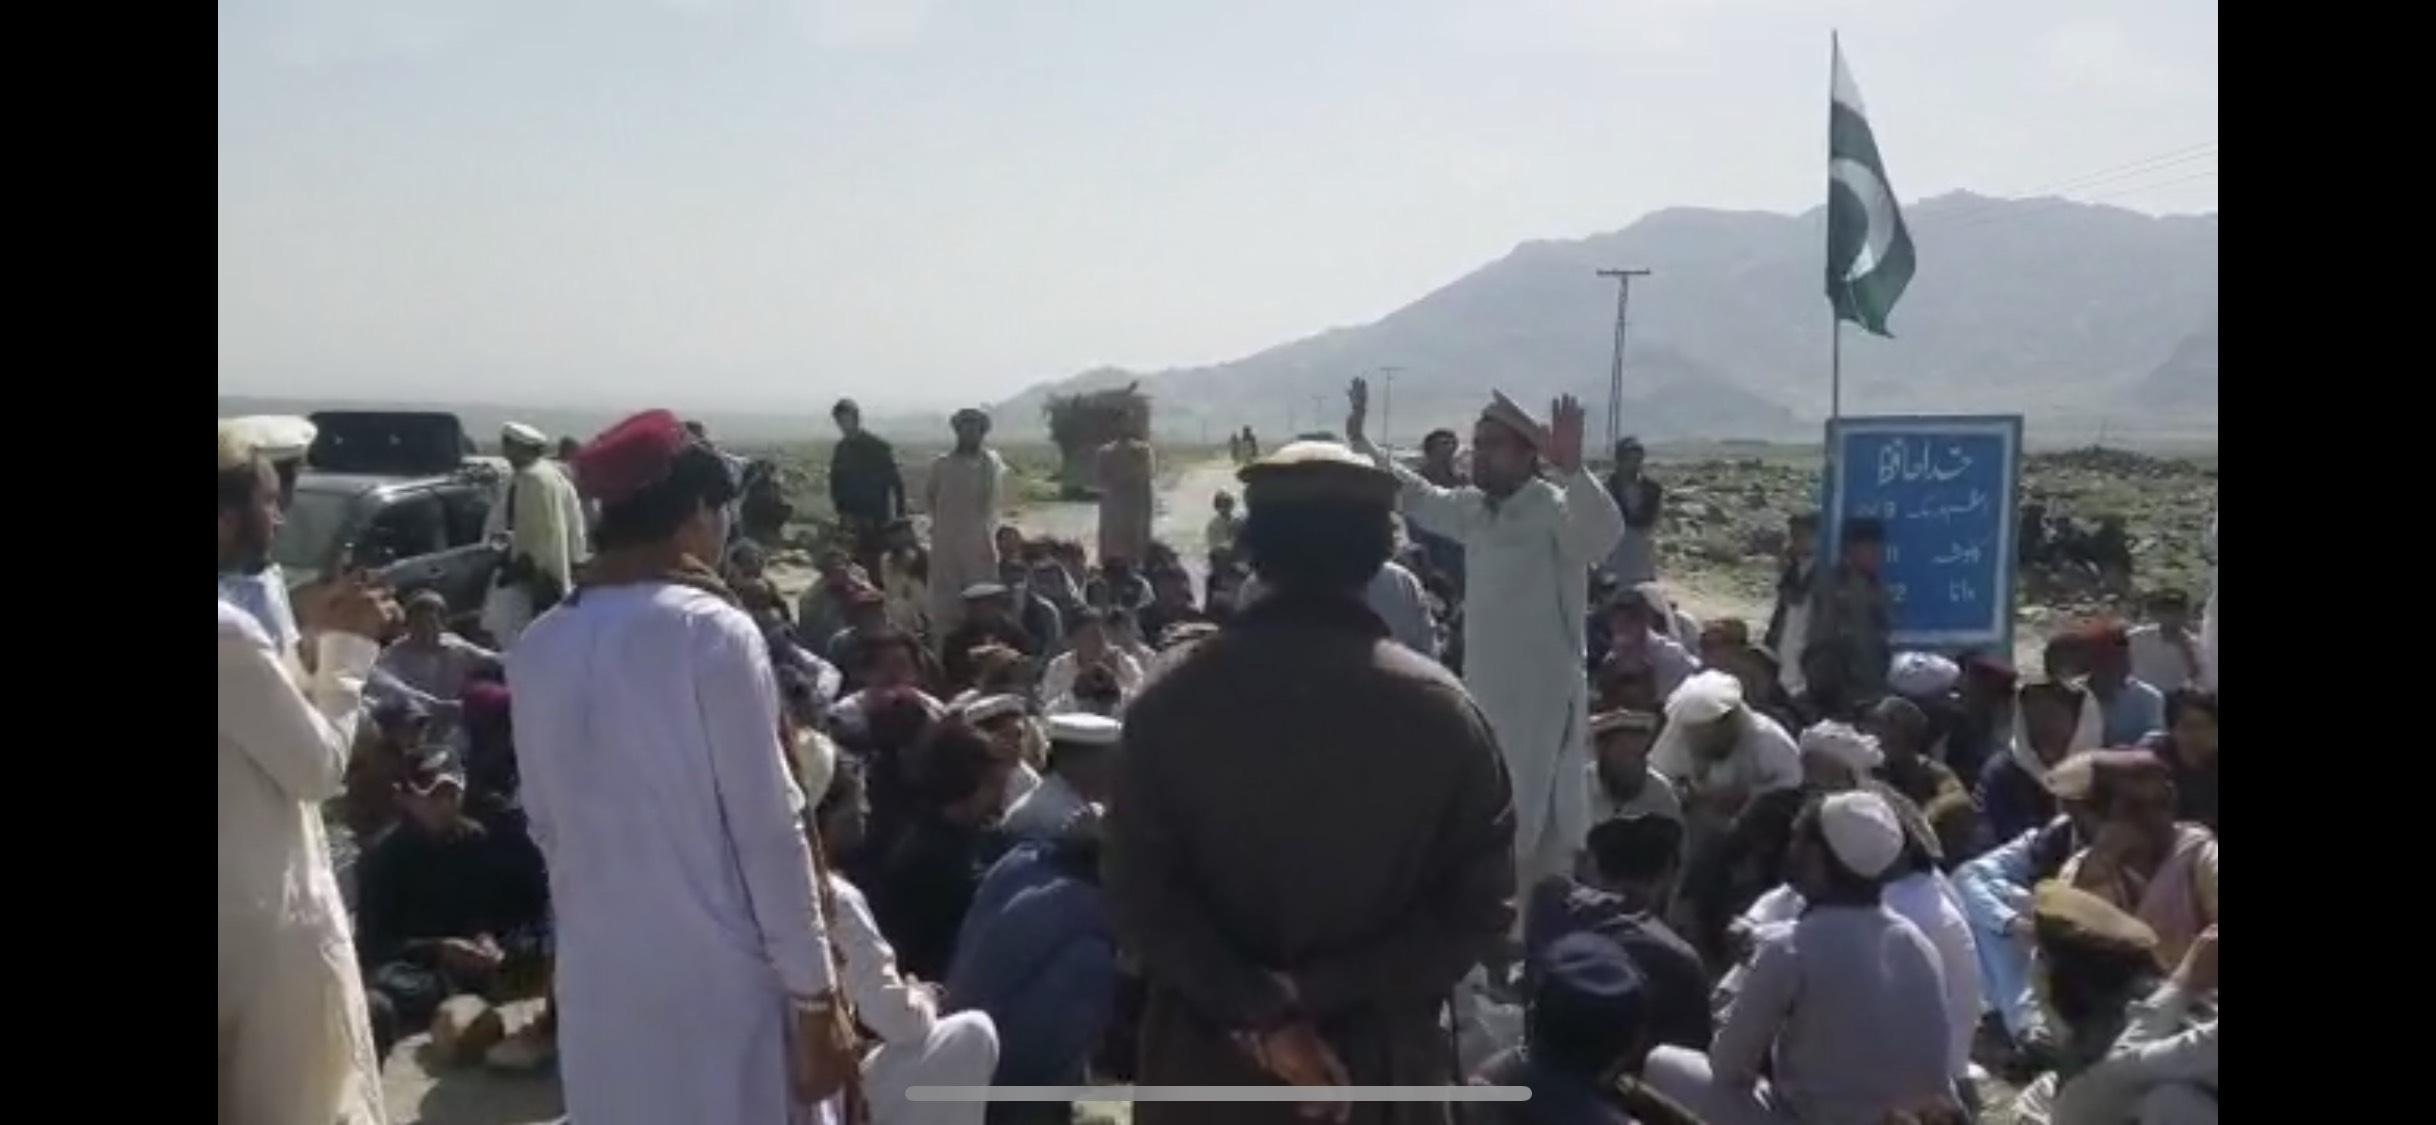 Pakistan: Fatwa puts journalists in serious danger